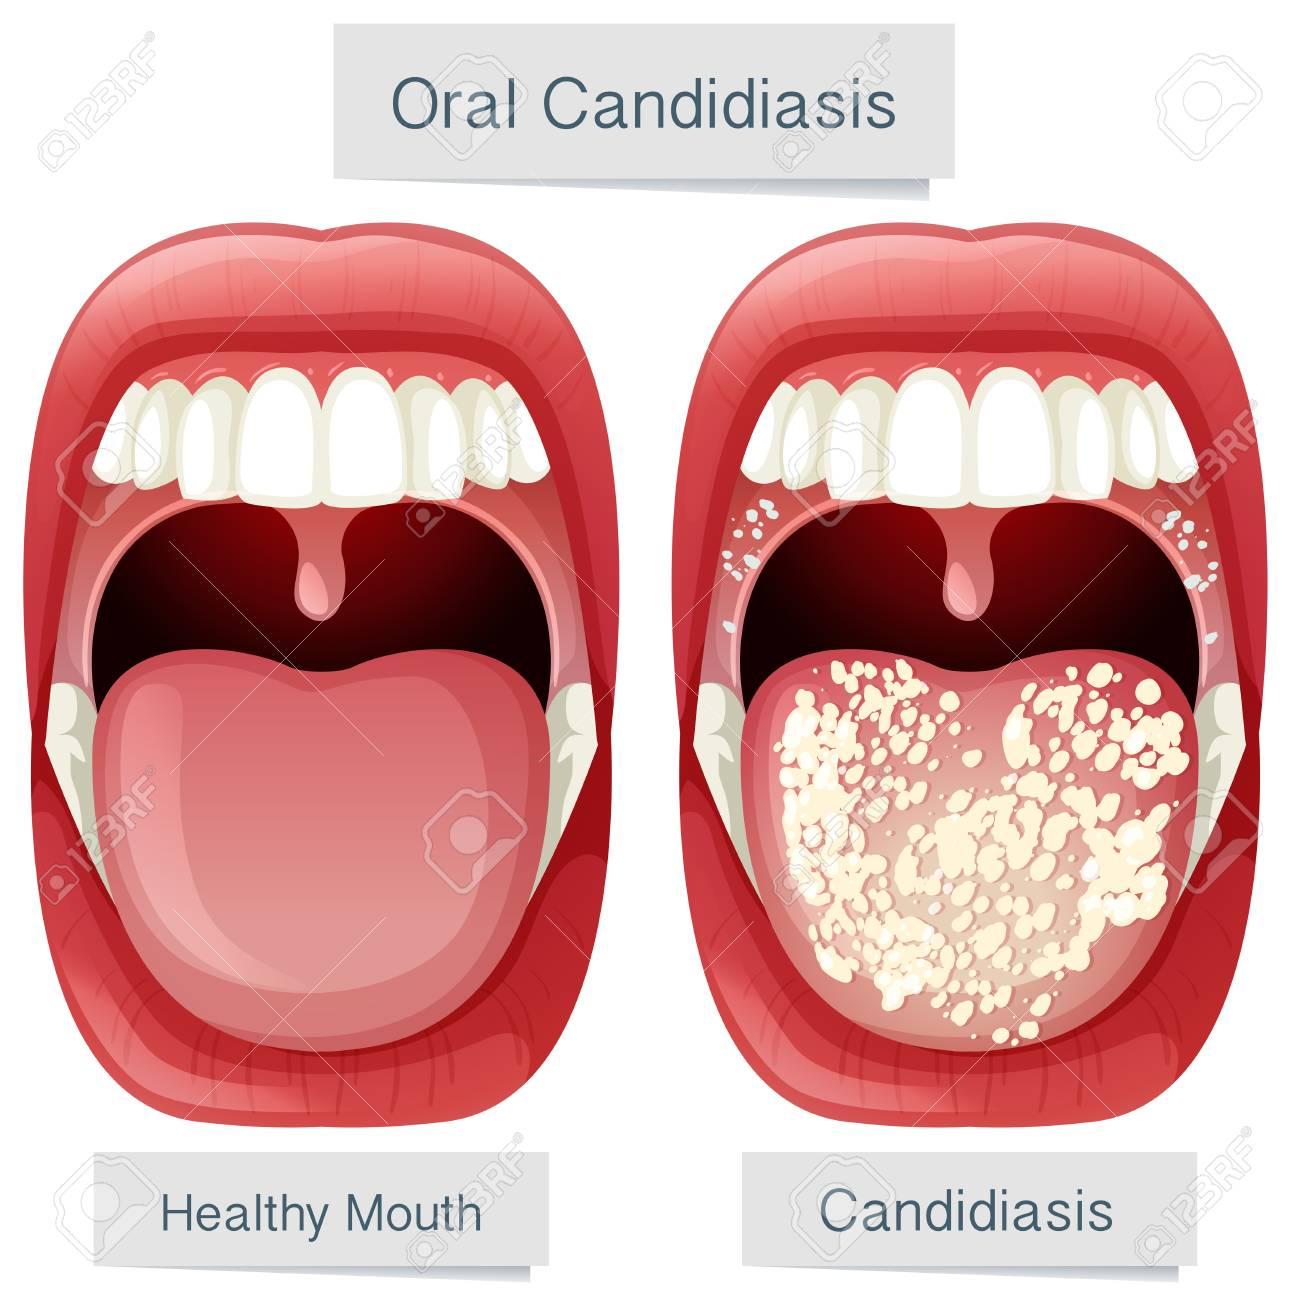 Human Mouth Anatomy Oral Candidiasis Illustration Royalty Free